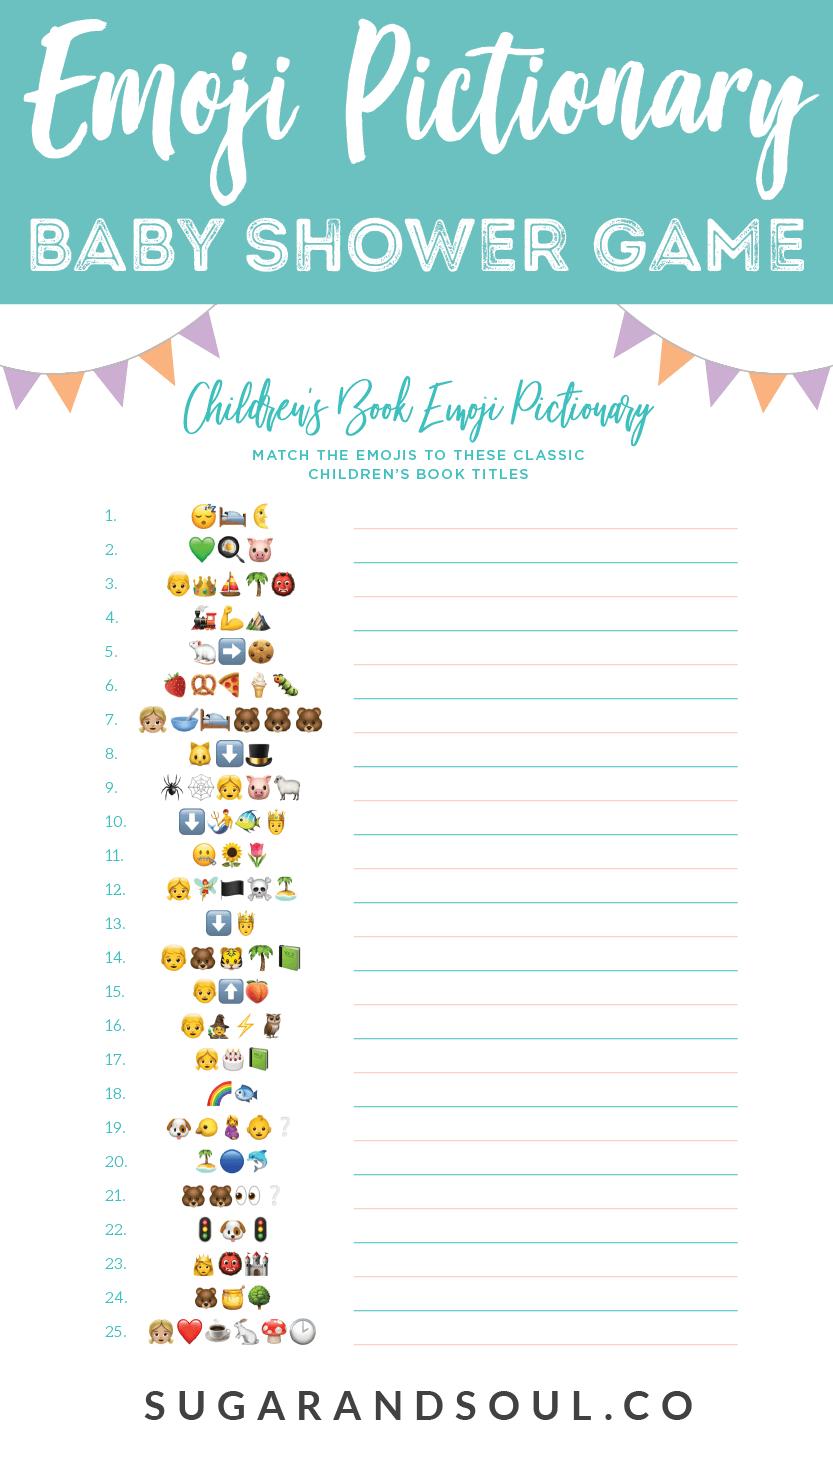 This Free Emoji Pictionary Baby Shower Game Printable Uses Emoji - Free Printable Baby Shower Games